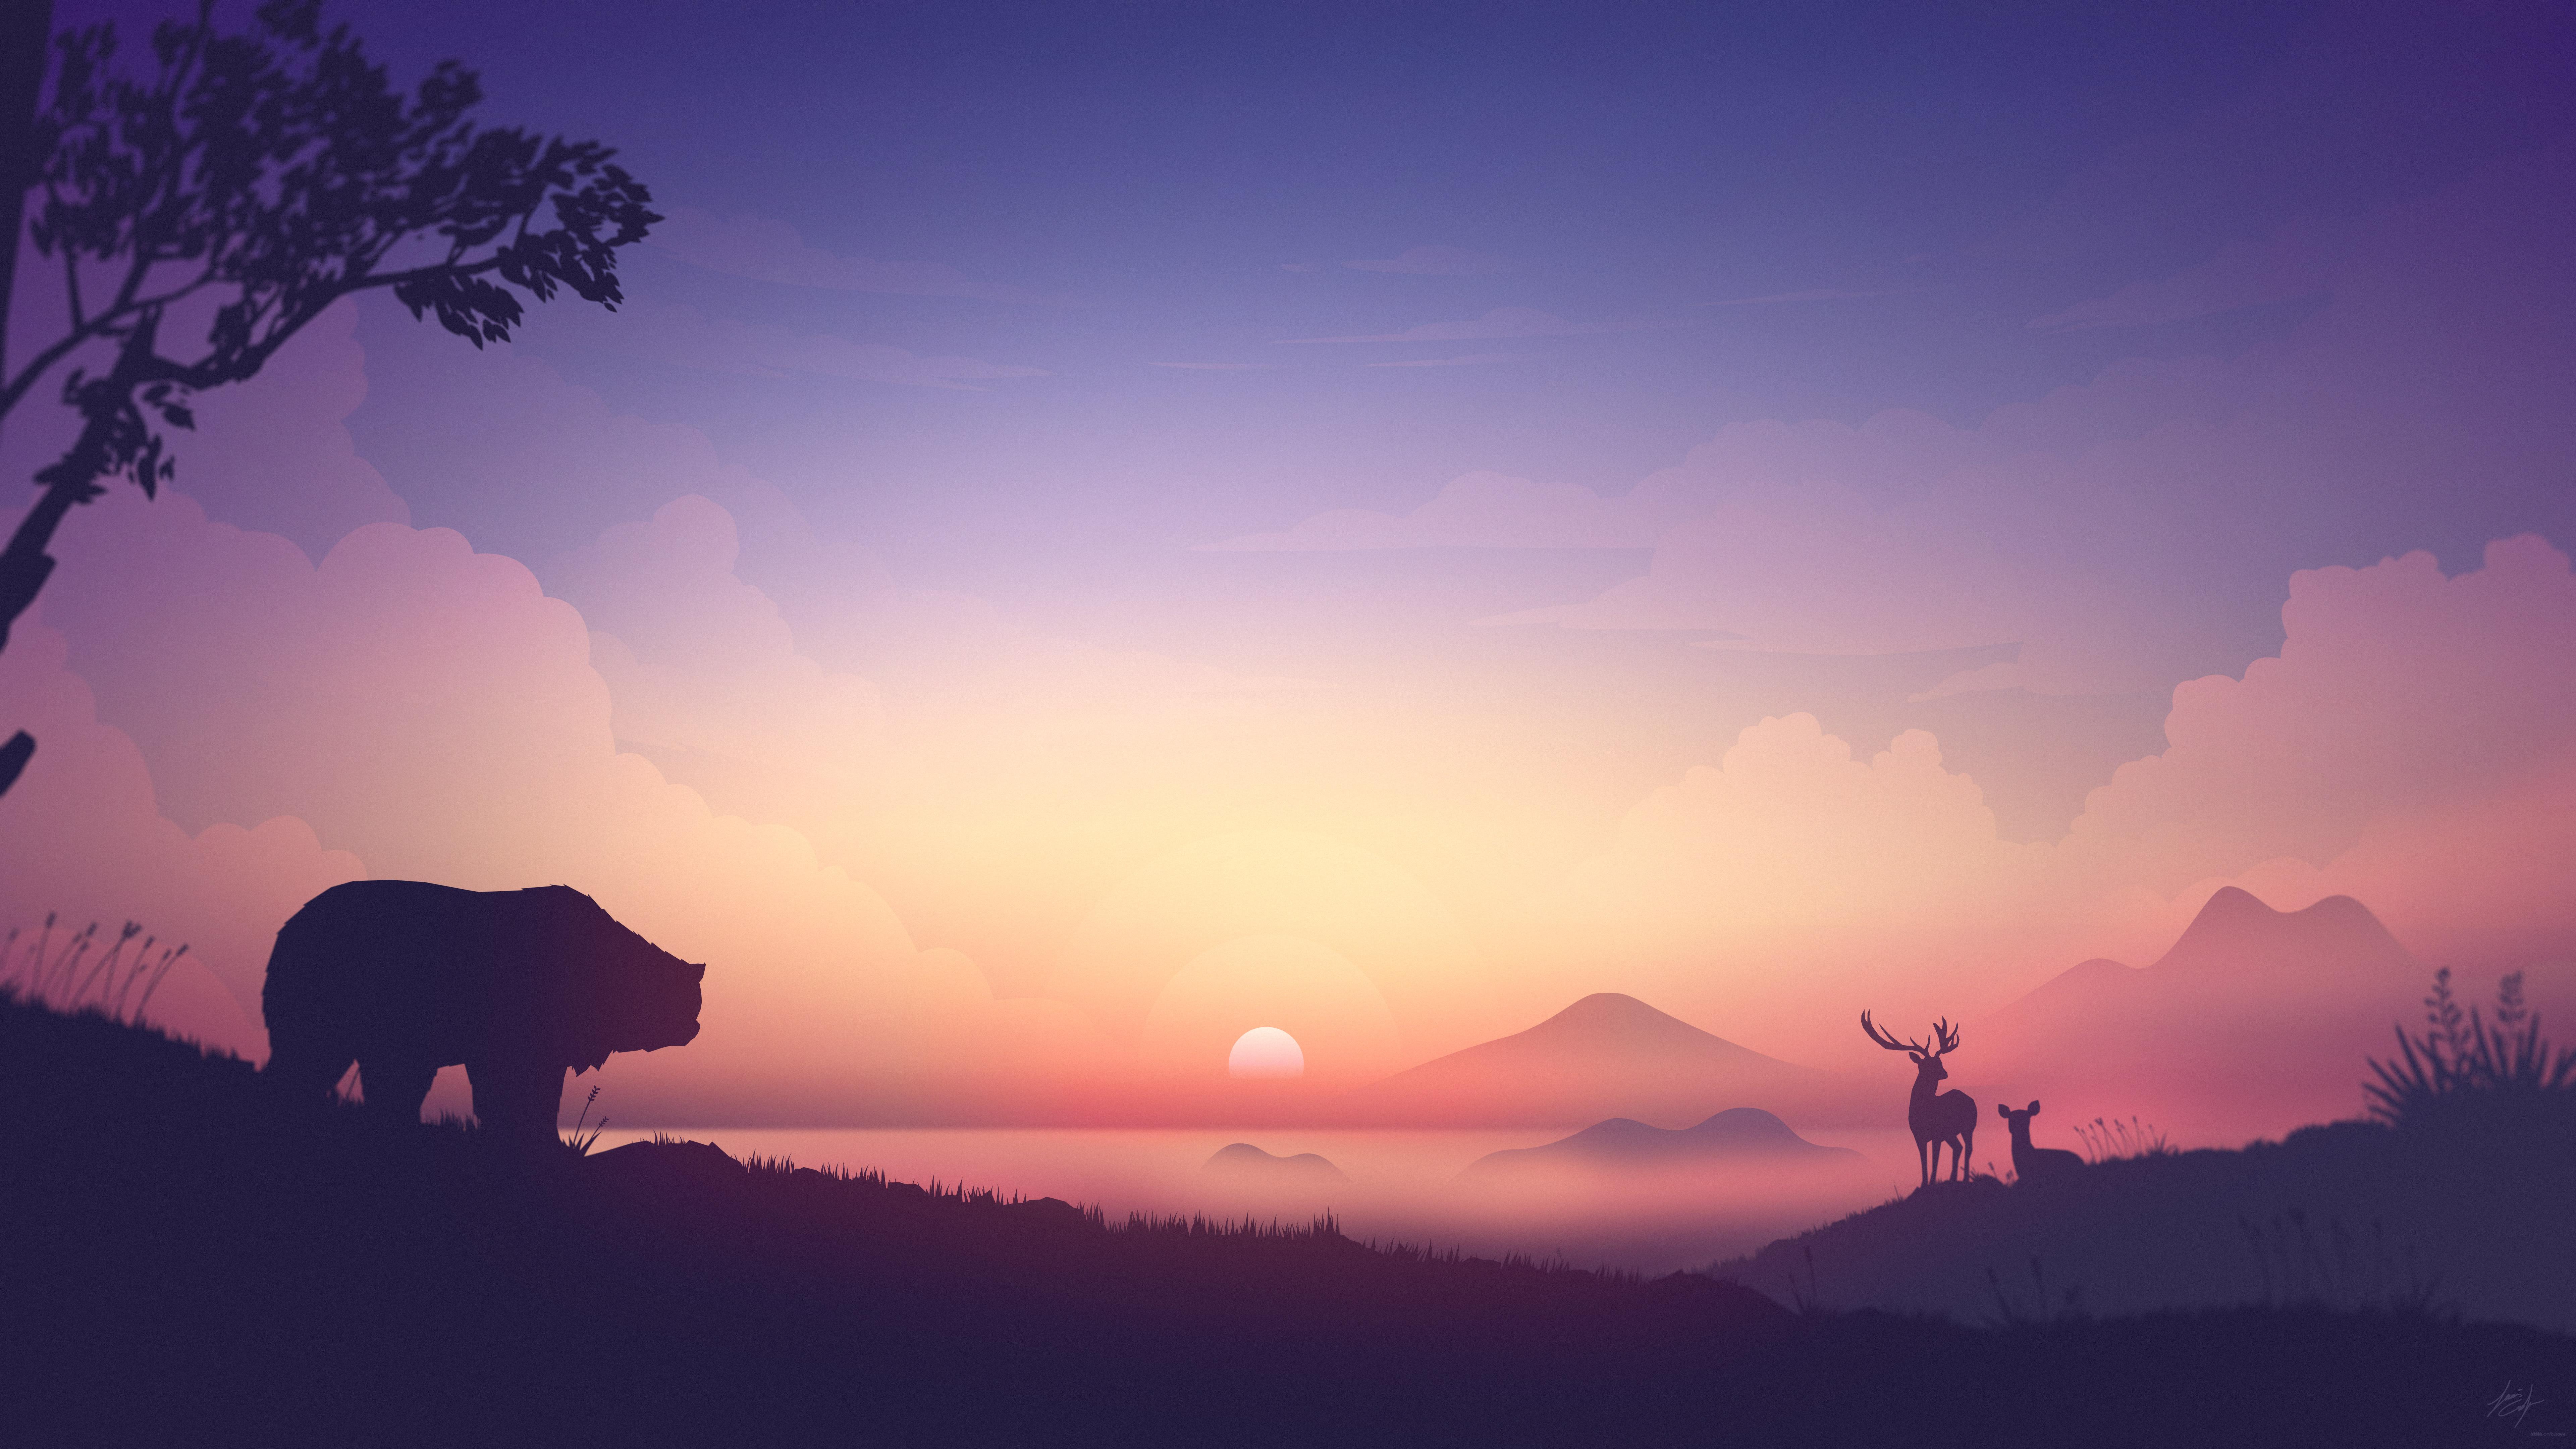 Bear Deer Mountains Sunrise Minimalism Artwork 8k Hd Artist 4k